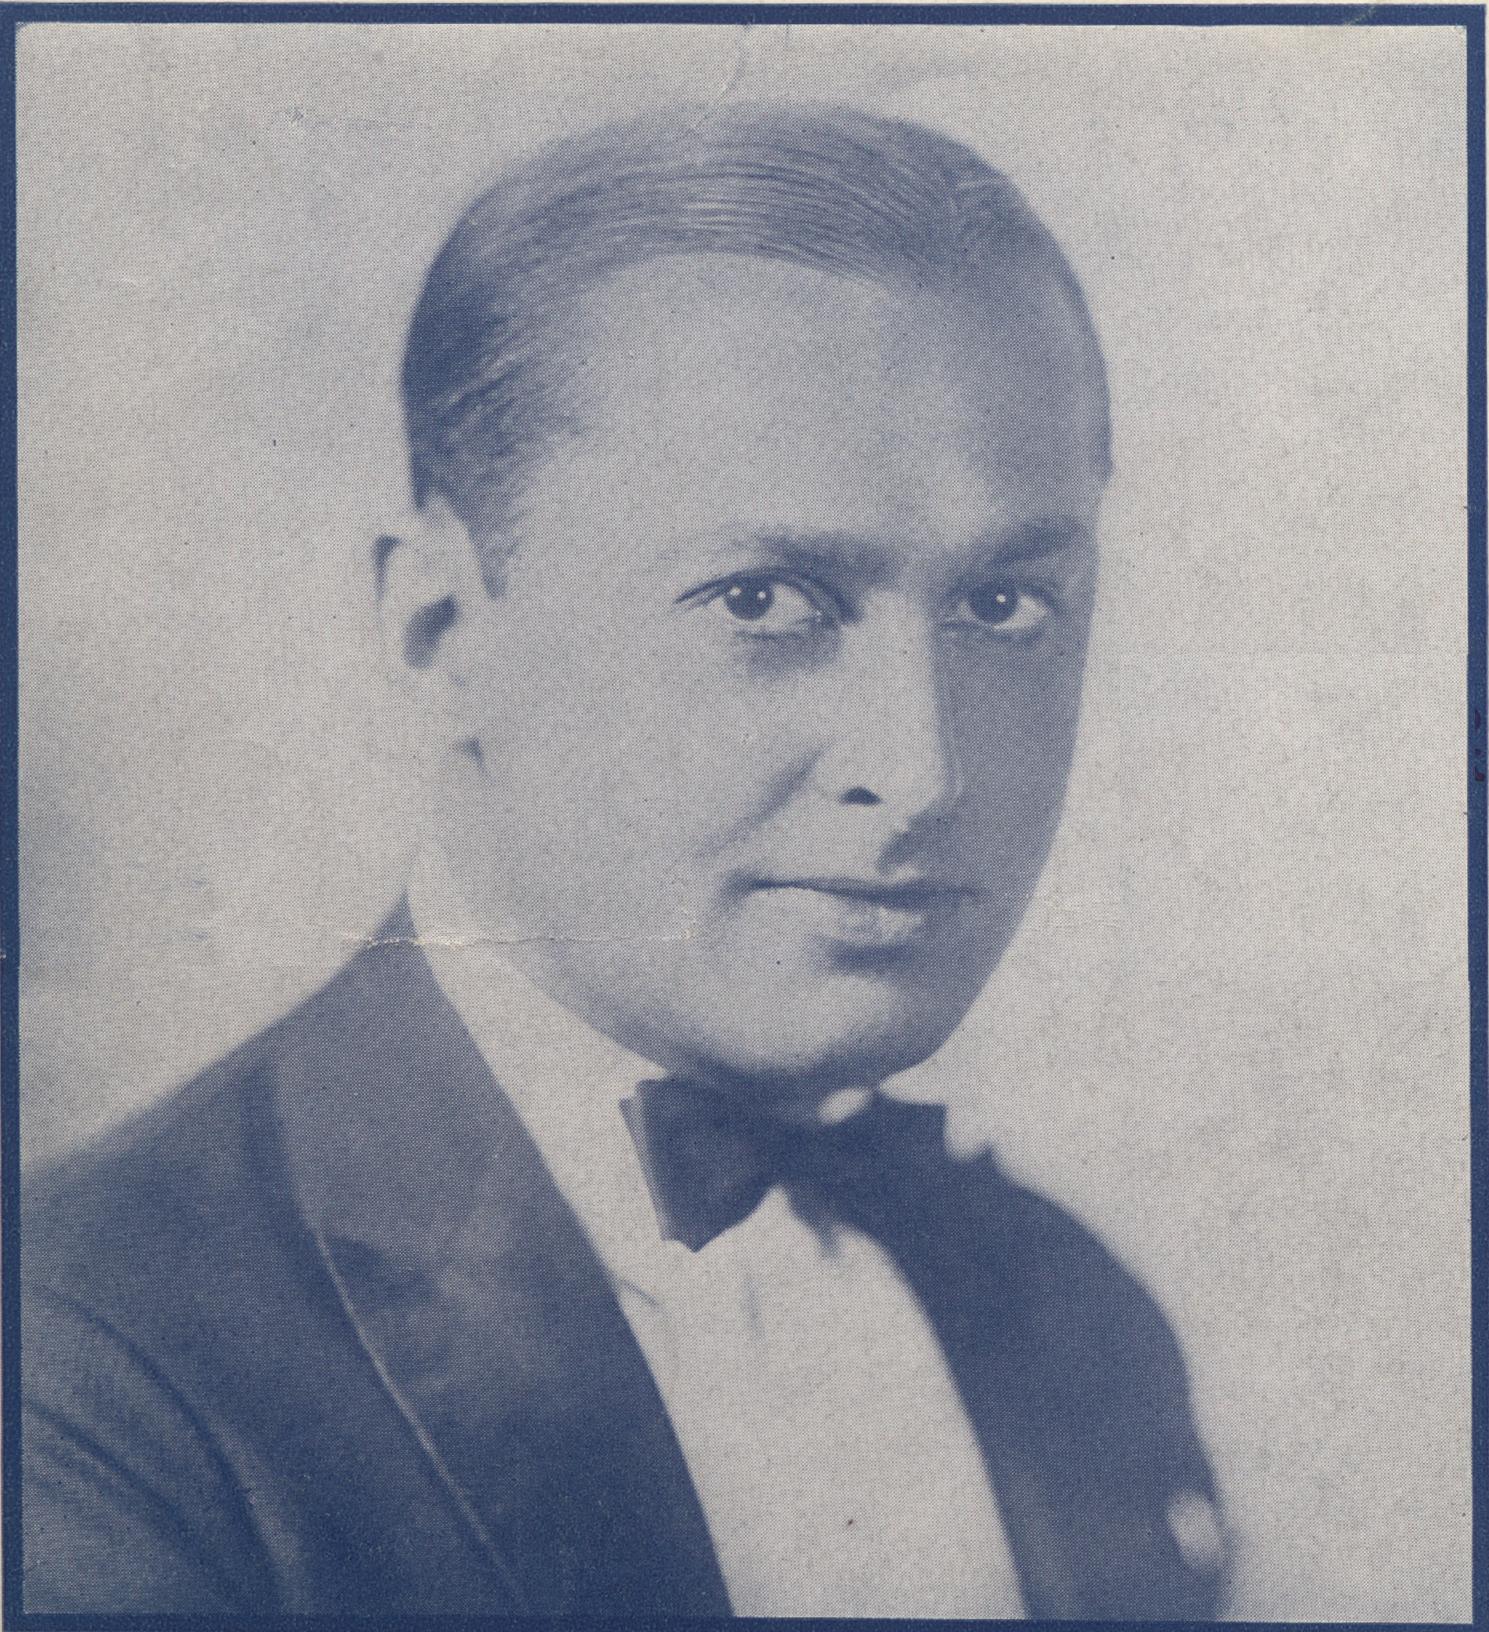 Ben Bernie as seen on early 1930s sheet music